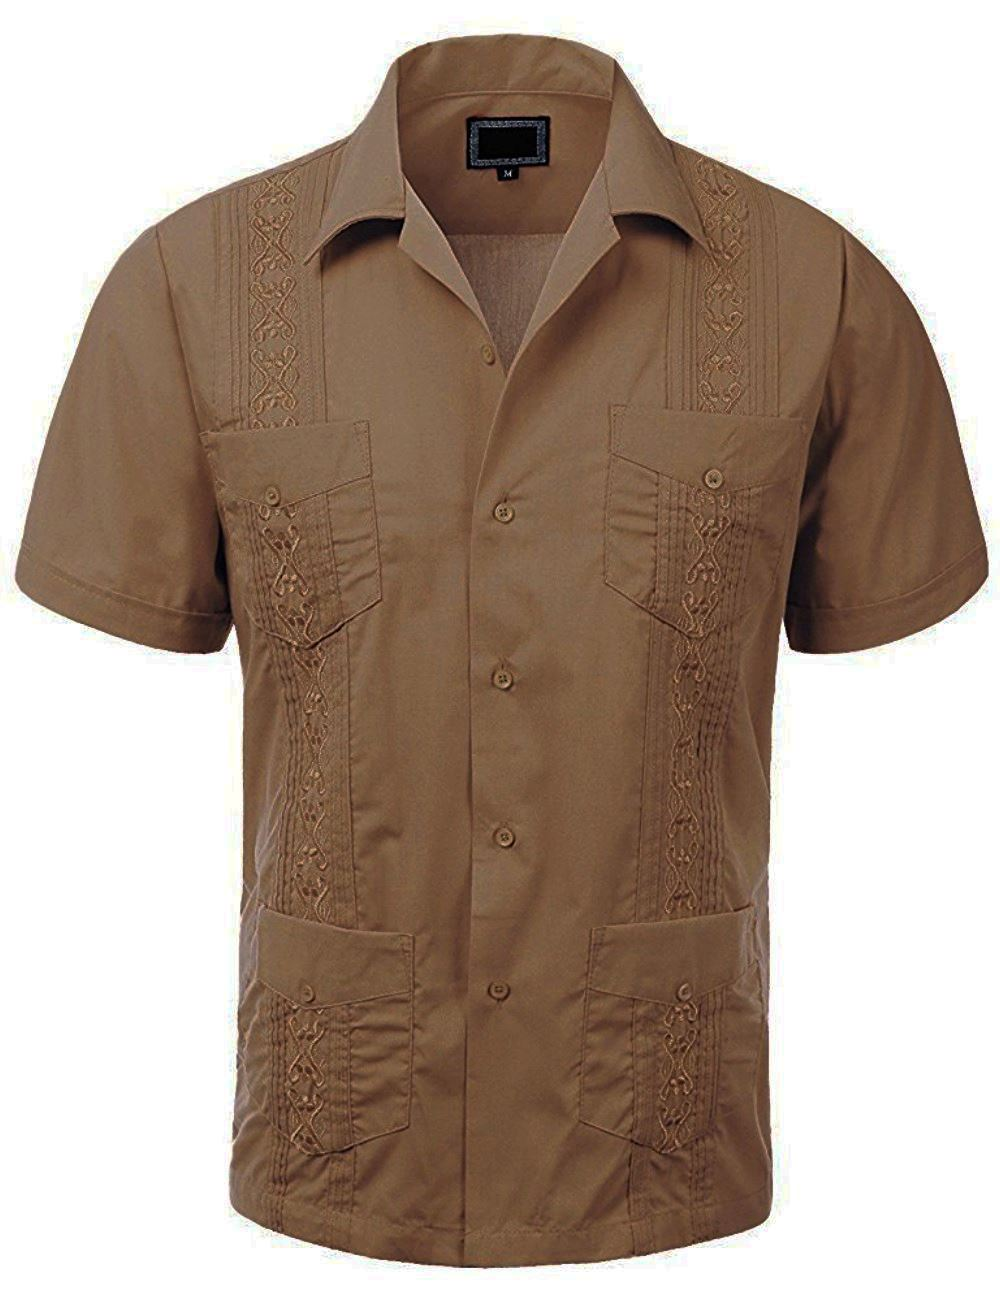 MAXIMOS-MEN-039-S-SHORT-SLEEVE-BUTTON-UP-CUBAN-GUAYABERA-DRESS-SHIRT thumbnail 16